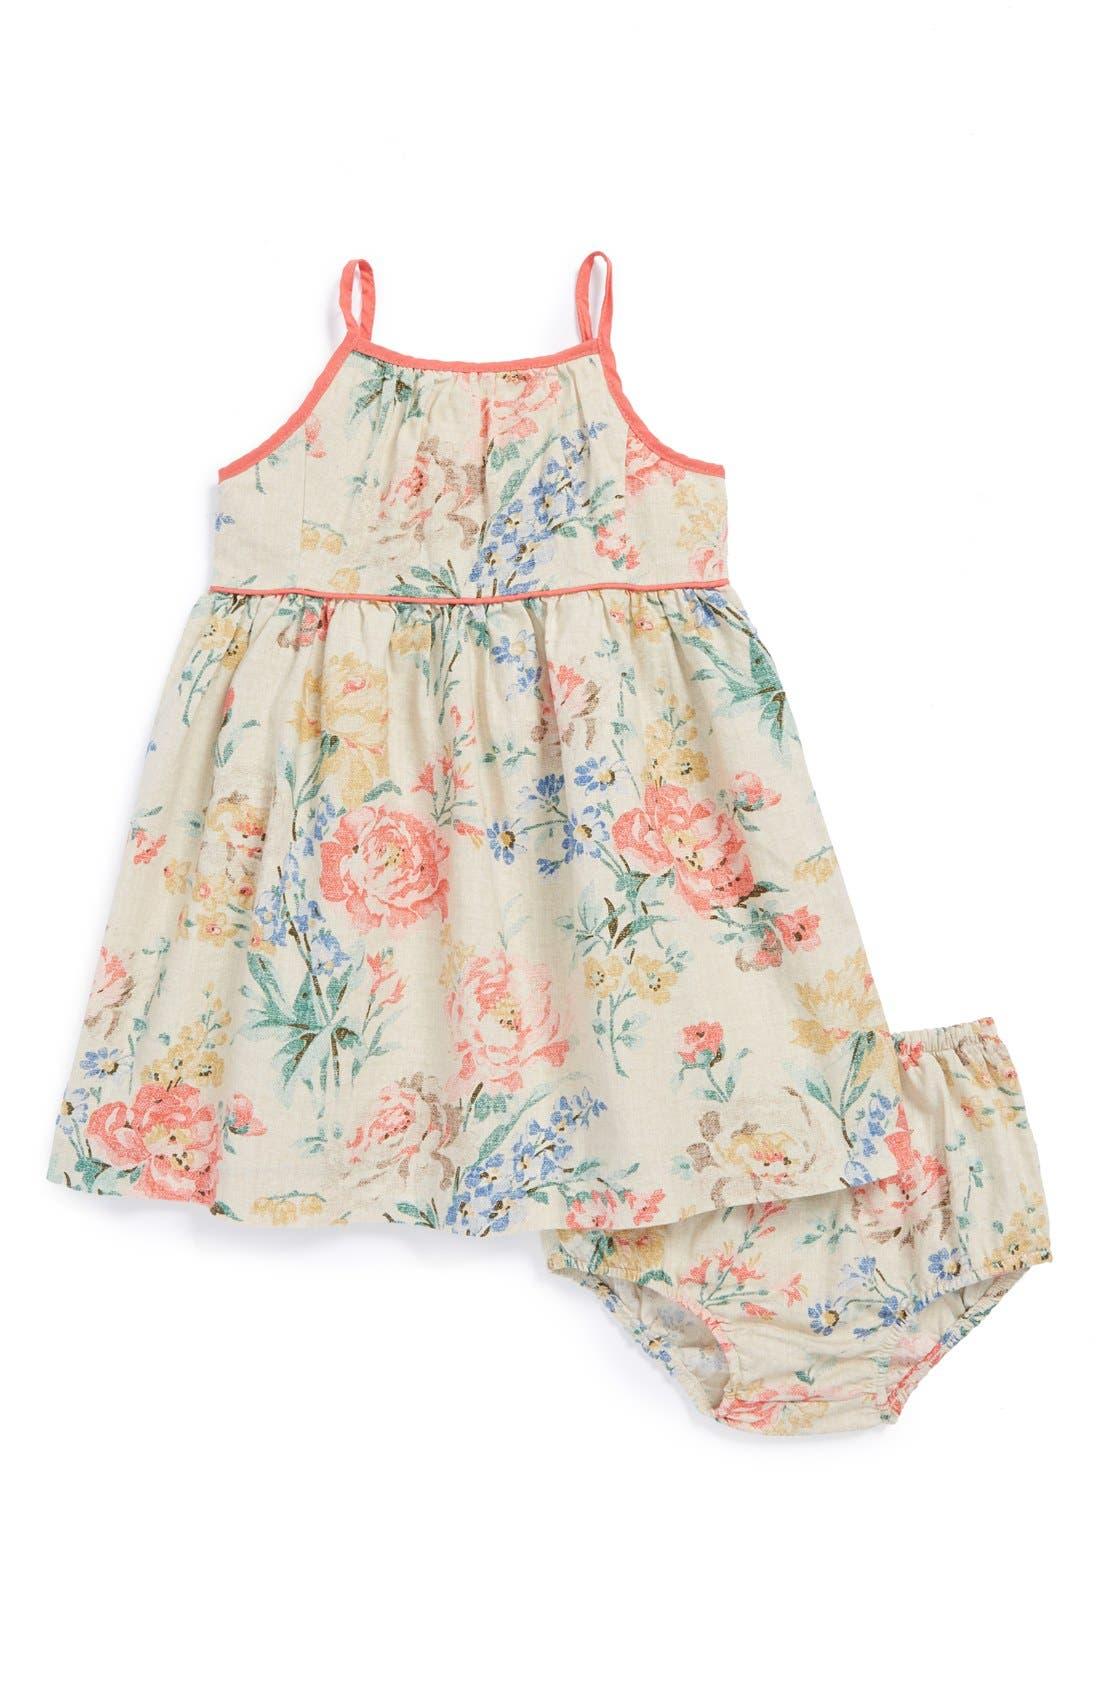 Alternate Image 1 Selected - Ralph Lauren Floral Print Sleeveless Dress & Bloomers (Baby Girls)